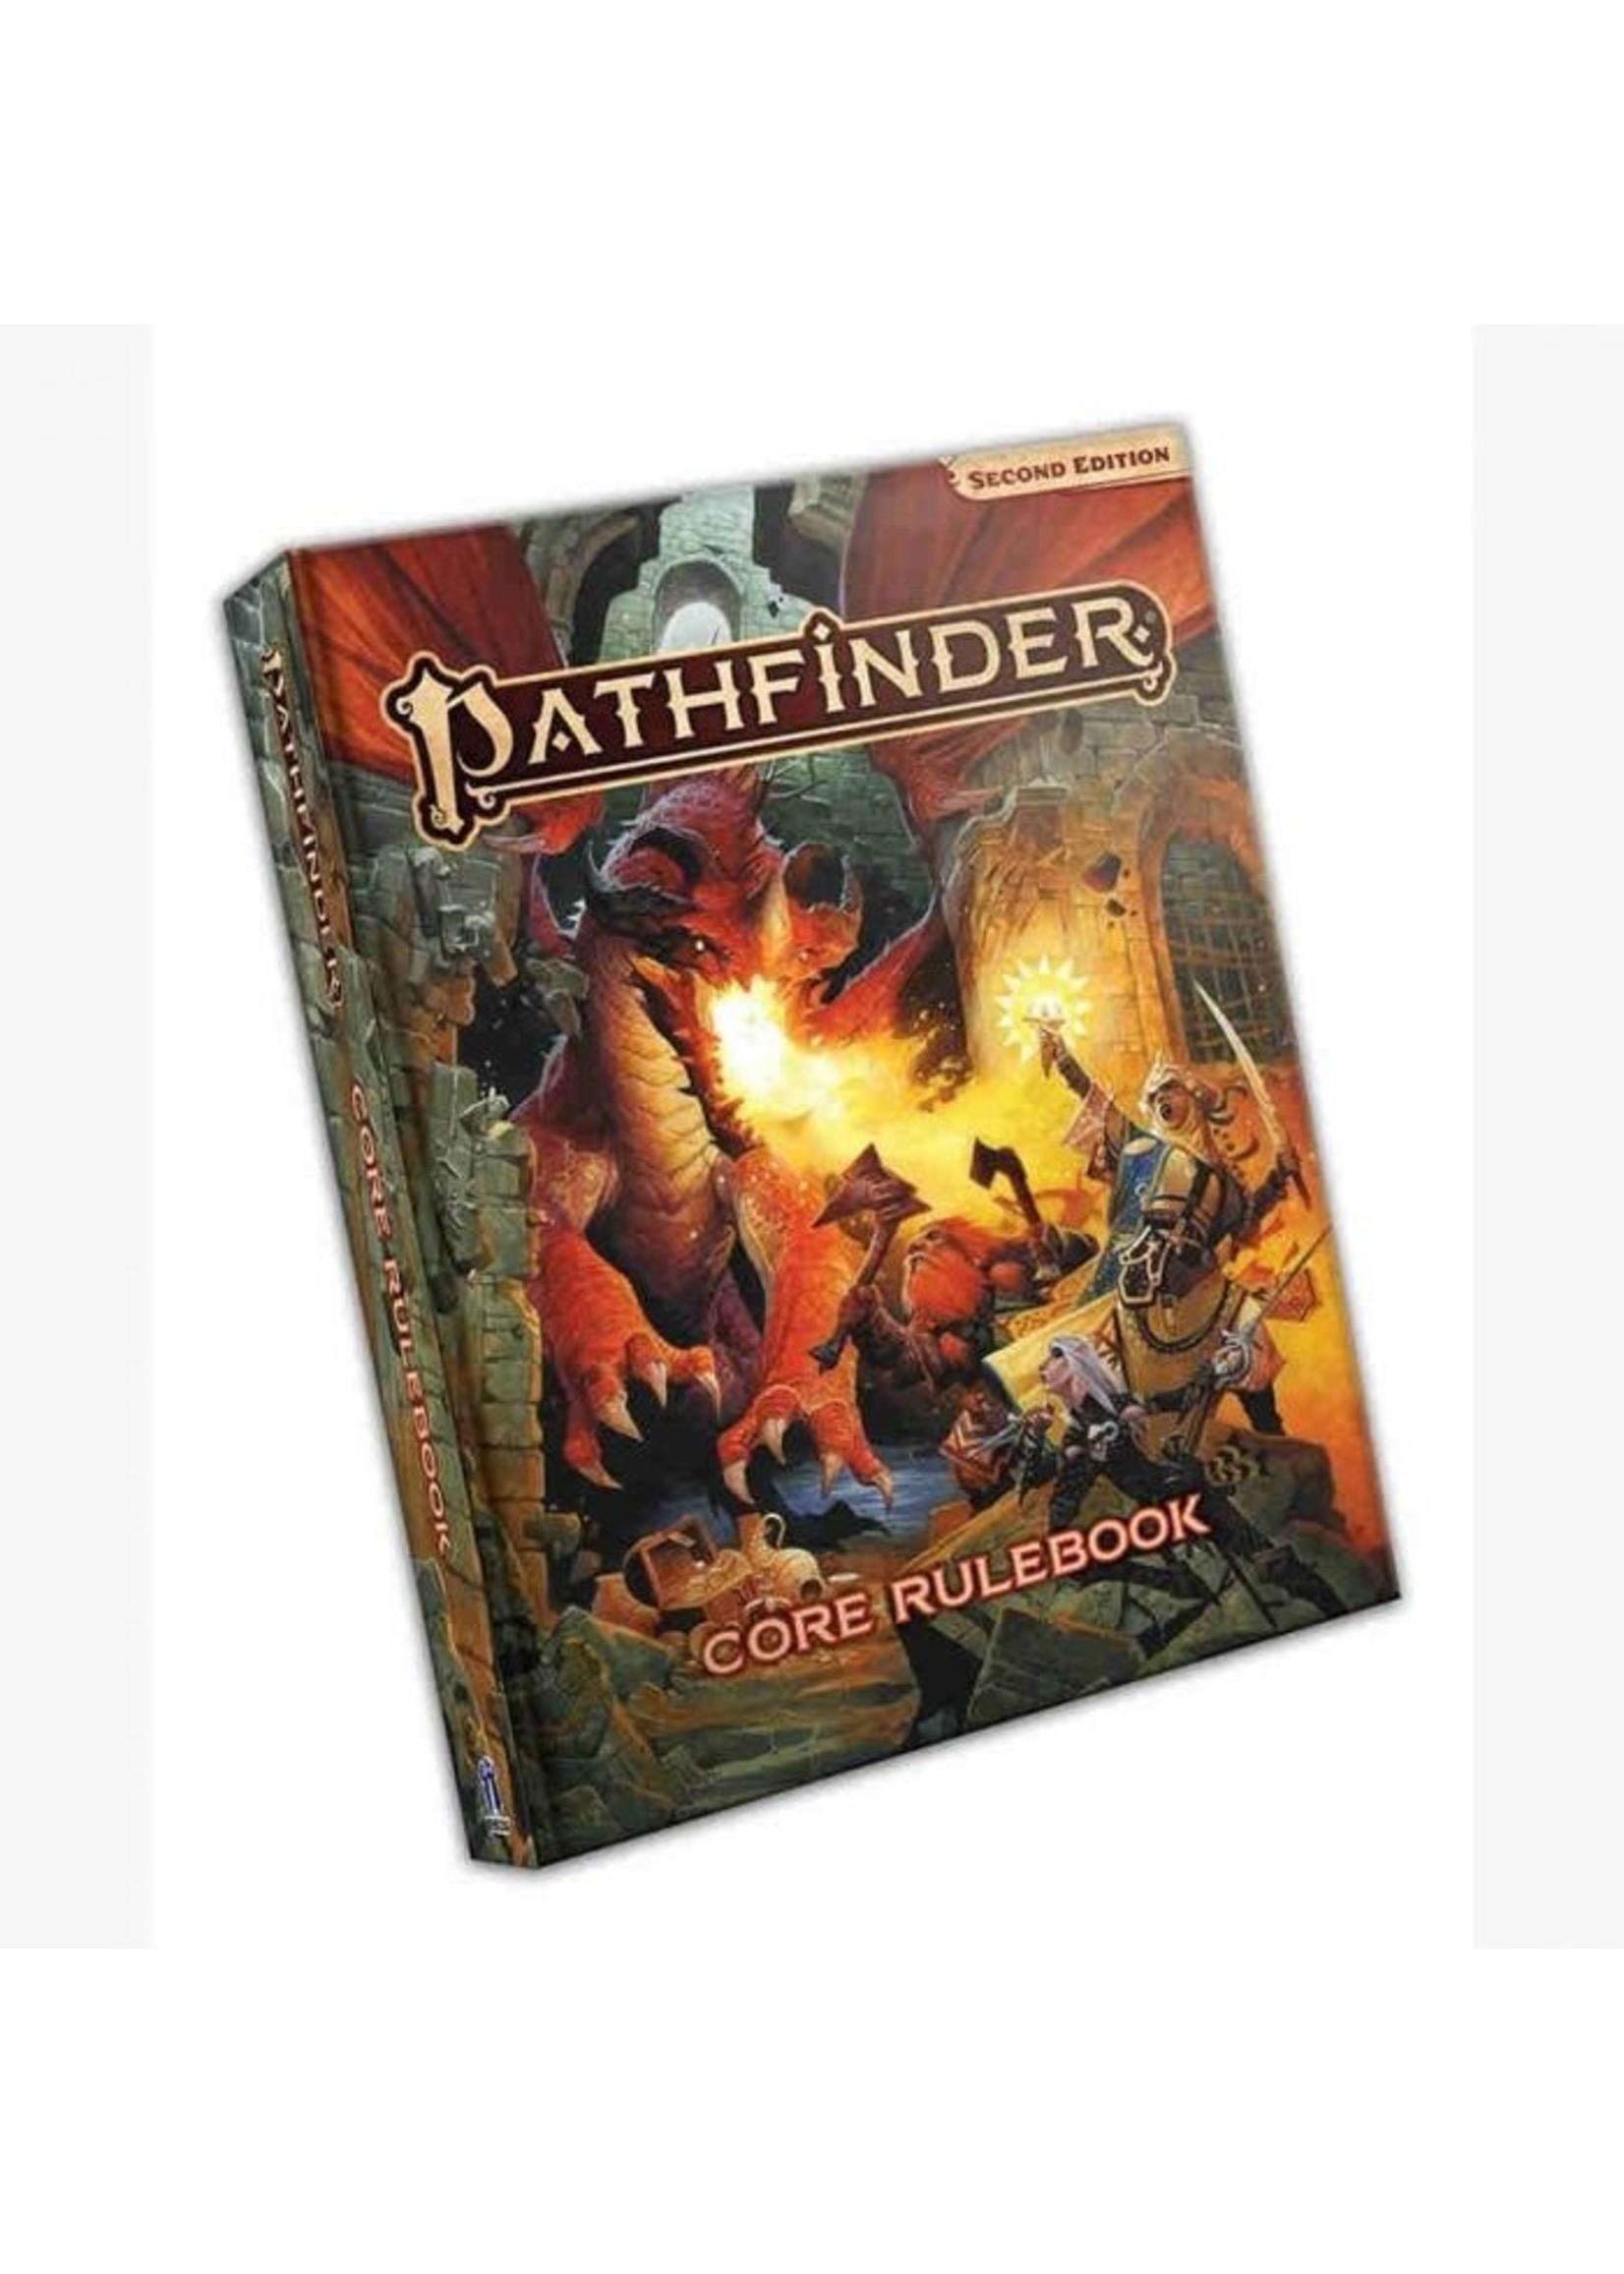 Pathfinder RPG: Core Rulebook Hardcover (P2)